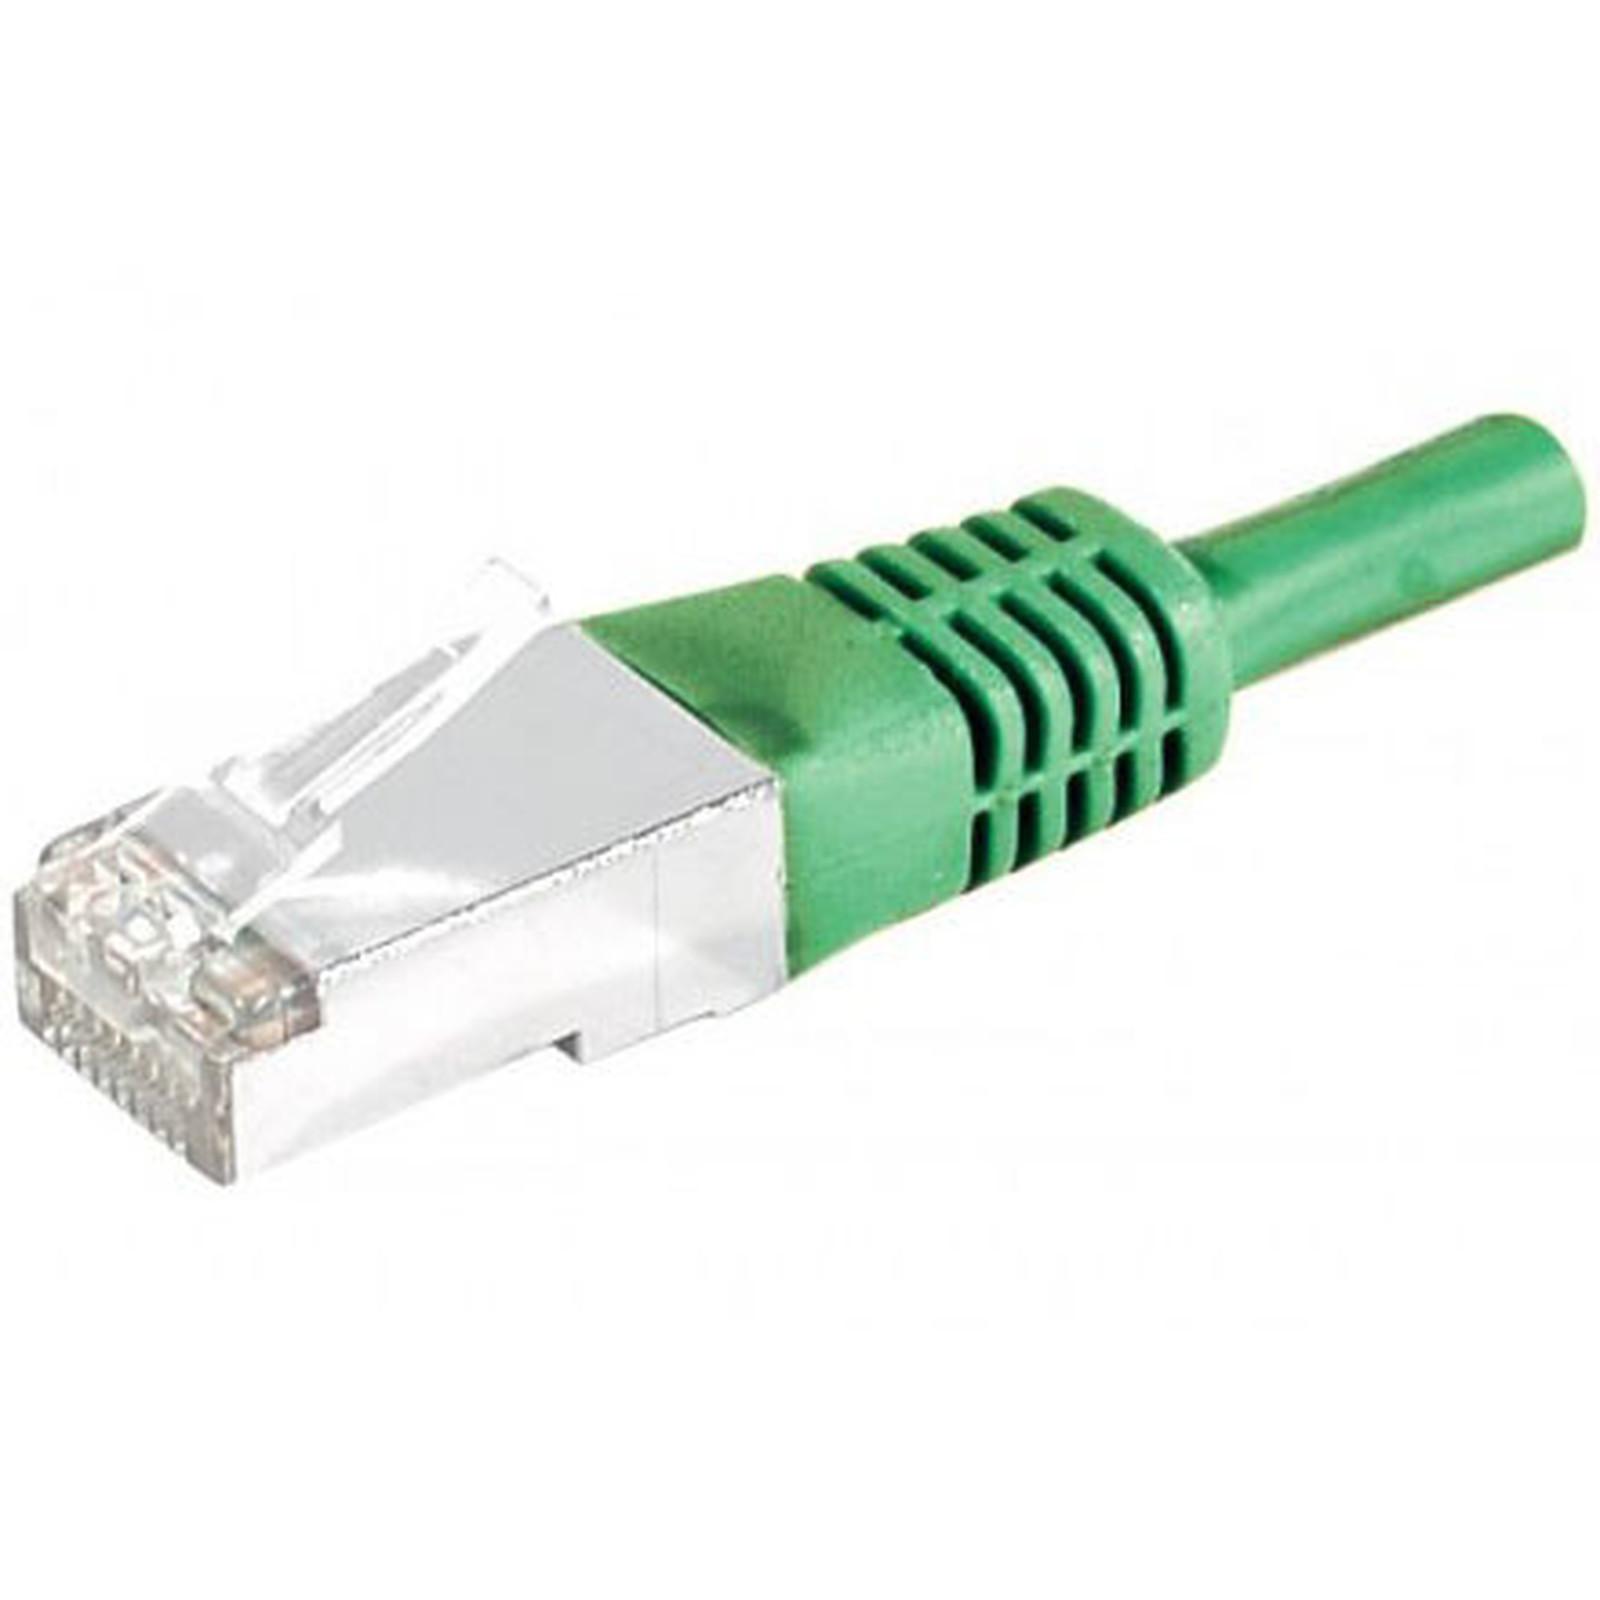 Câble RJ45 catégorie 5e F/UTP 2 m (vert)